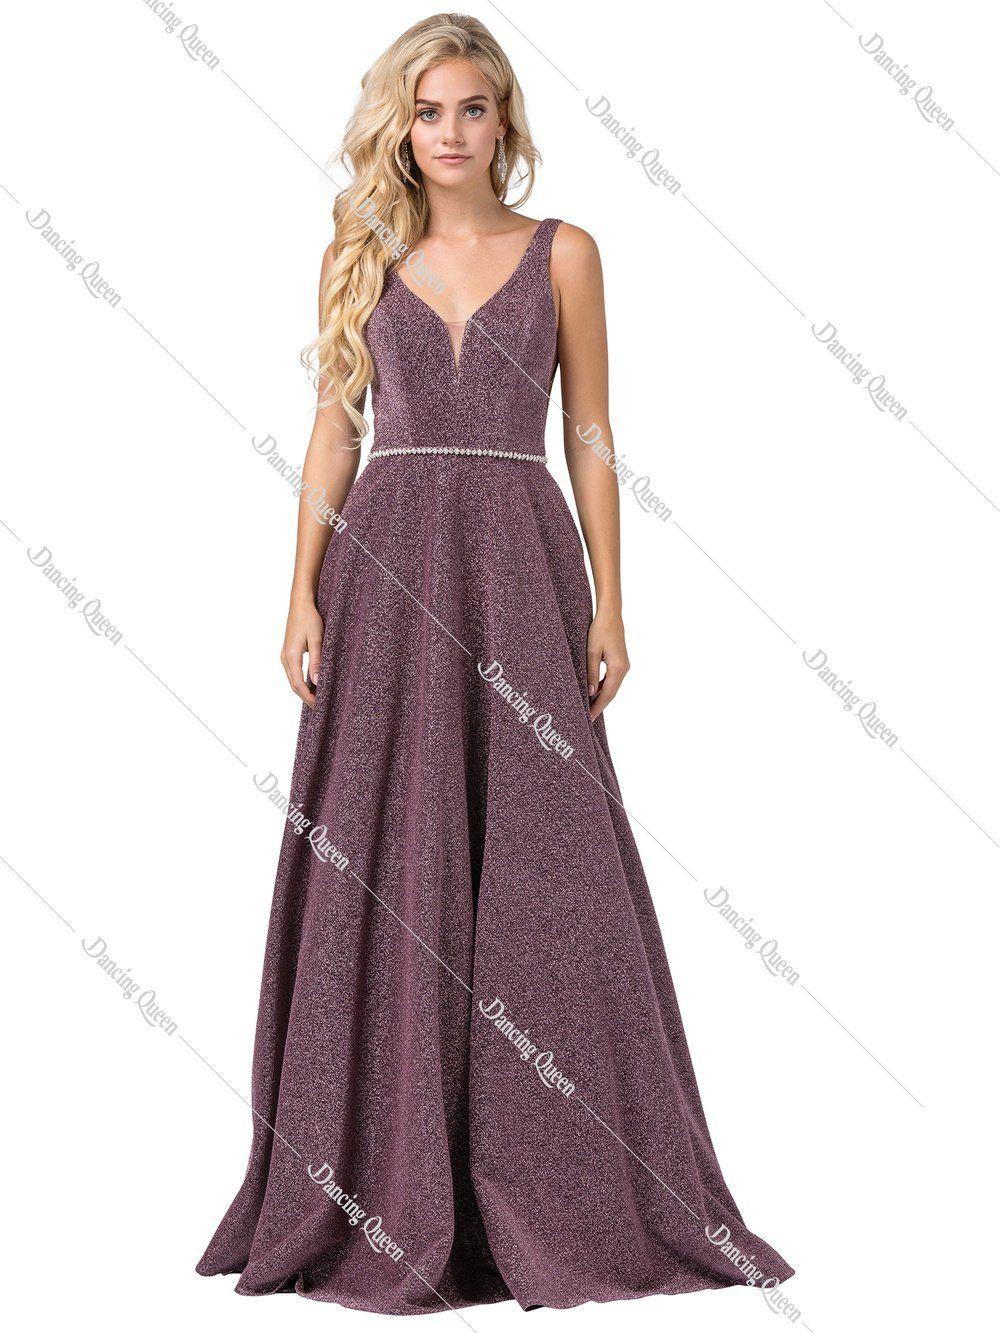 2b9847b629ac Silver Belts, Ball Gowns, Prom, Metal, Formal Dresses, V Neck,